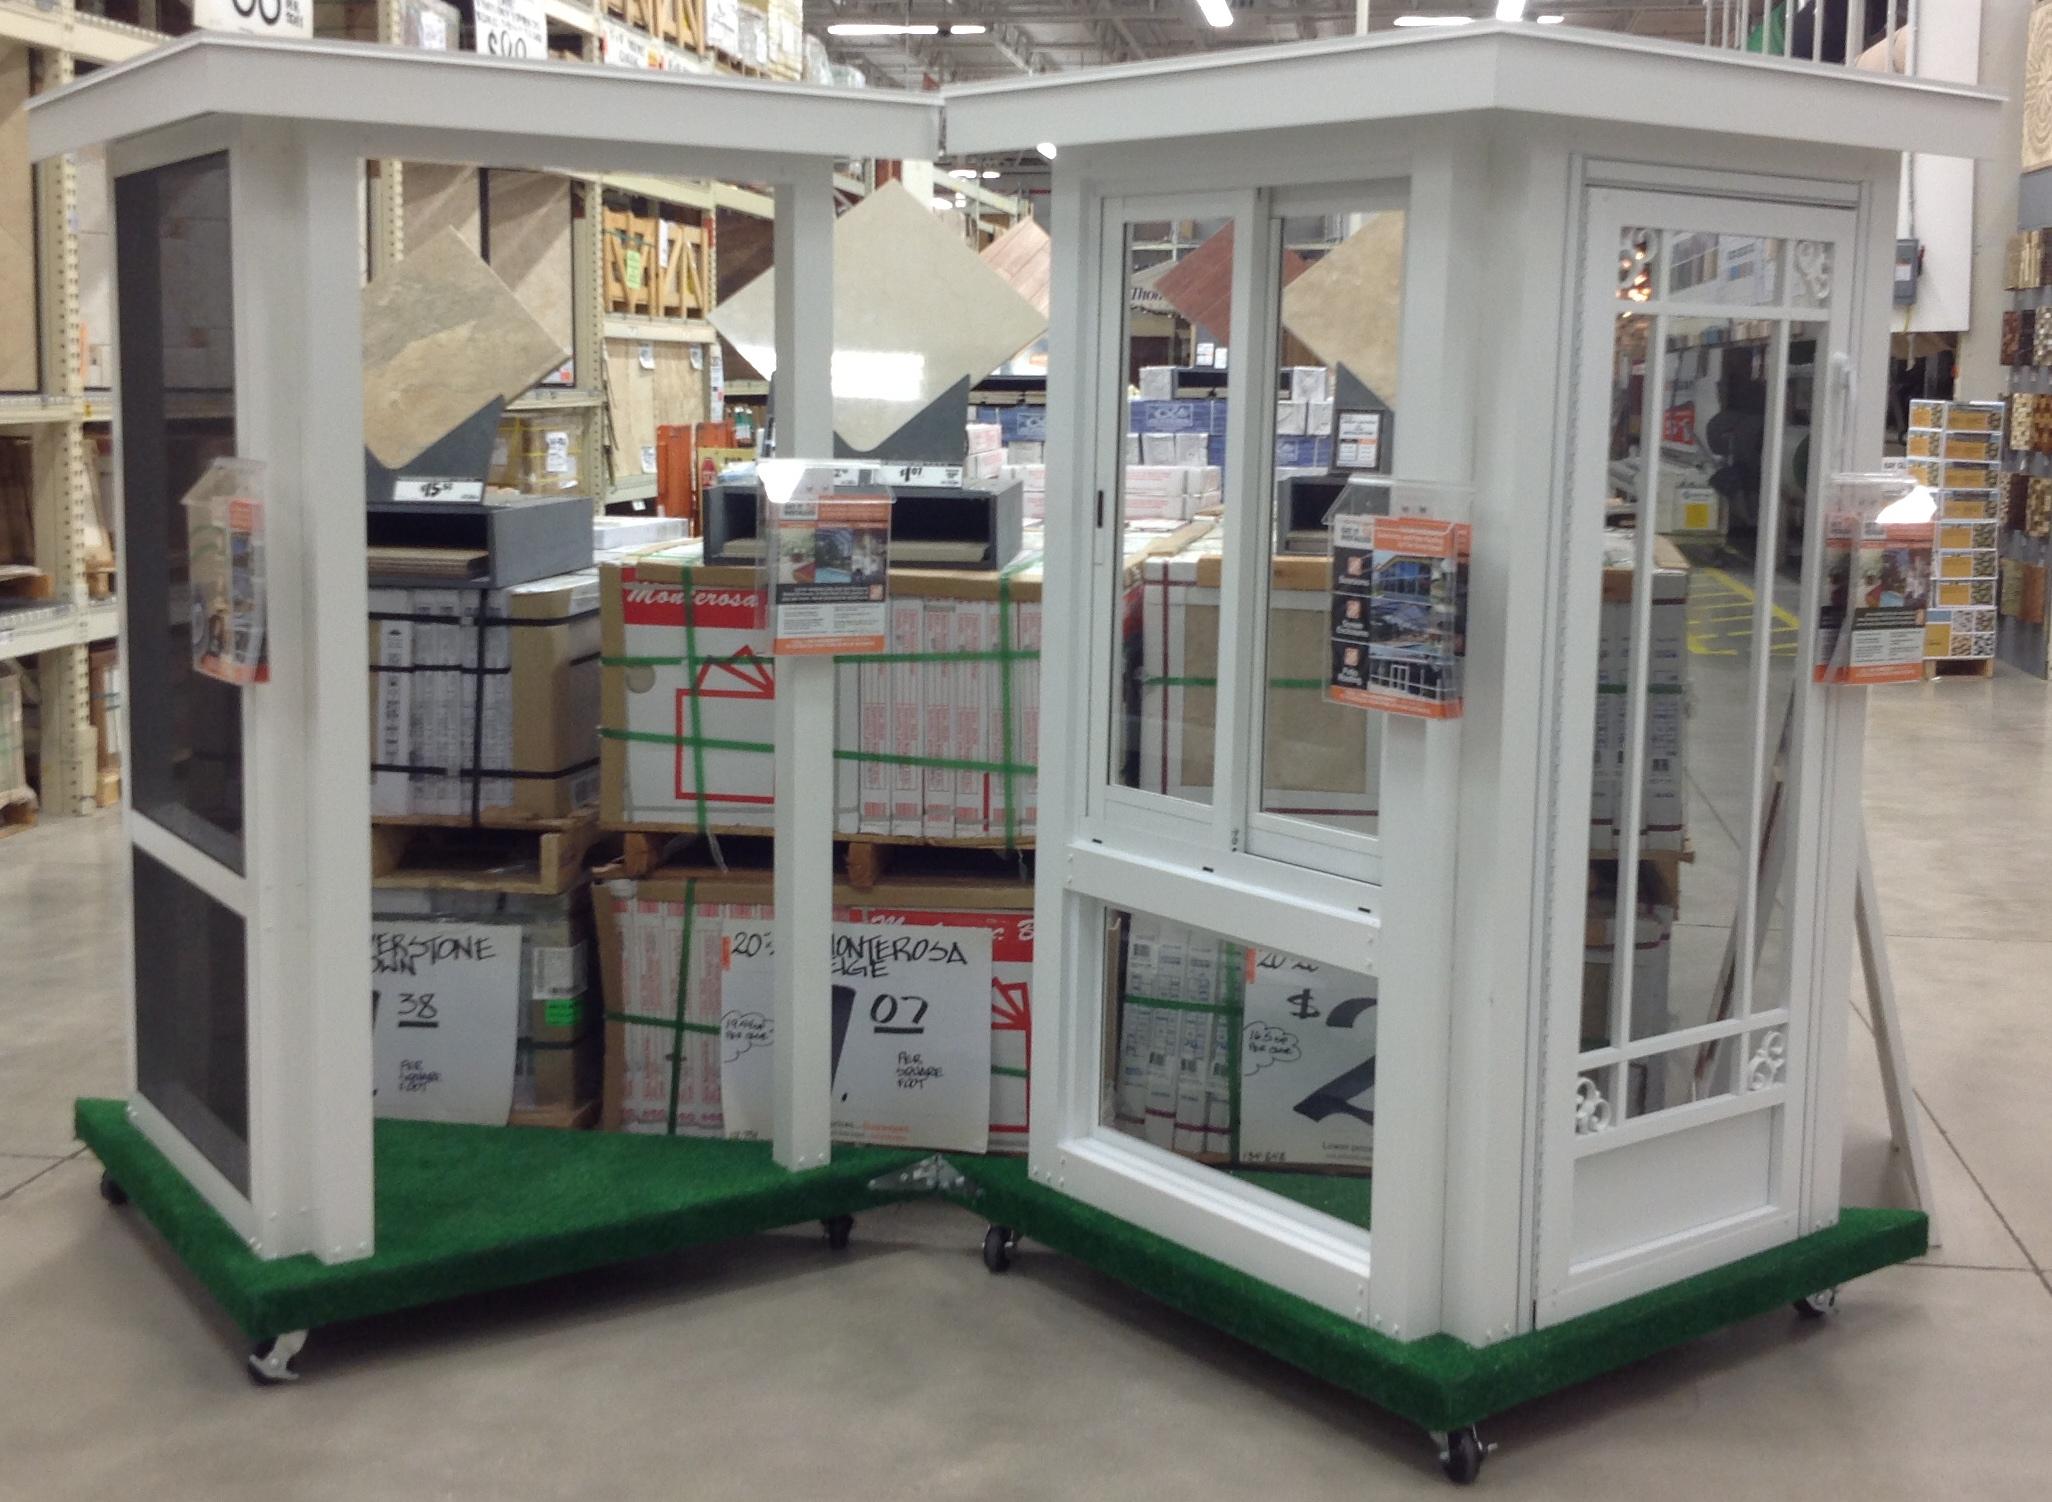 Retail Sales Displays In Lake Worth Home Depots Help Venetian - Patio shoppers